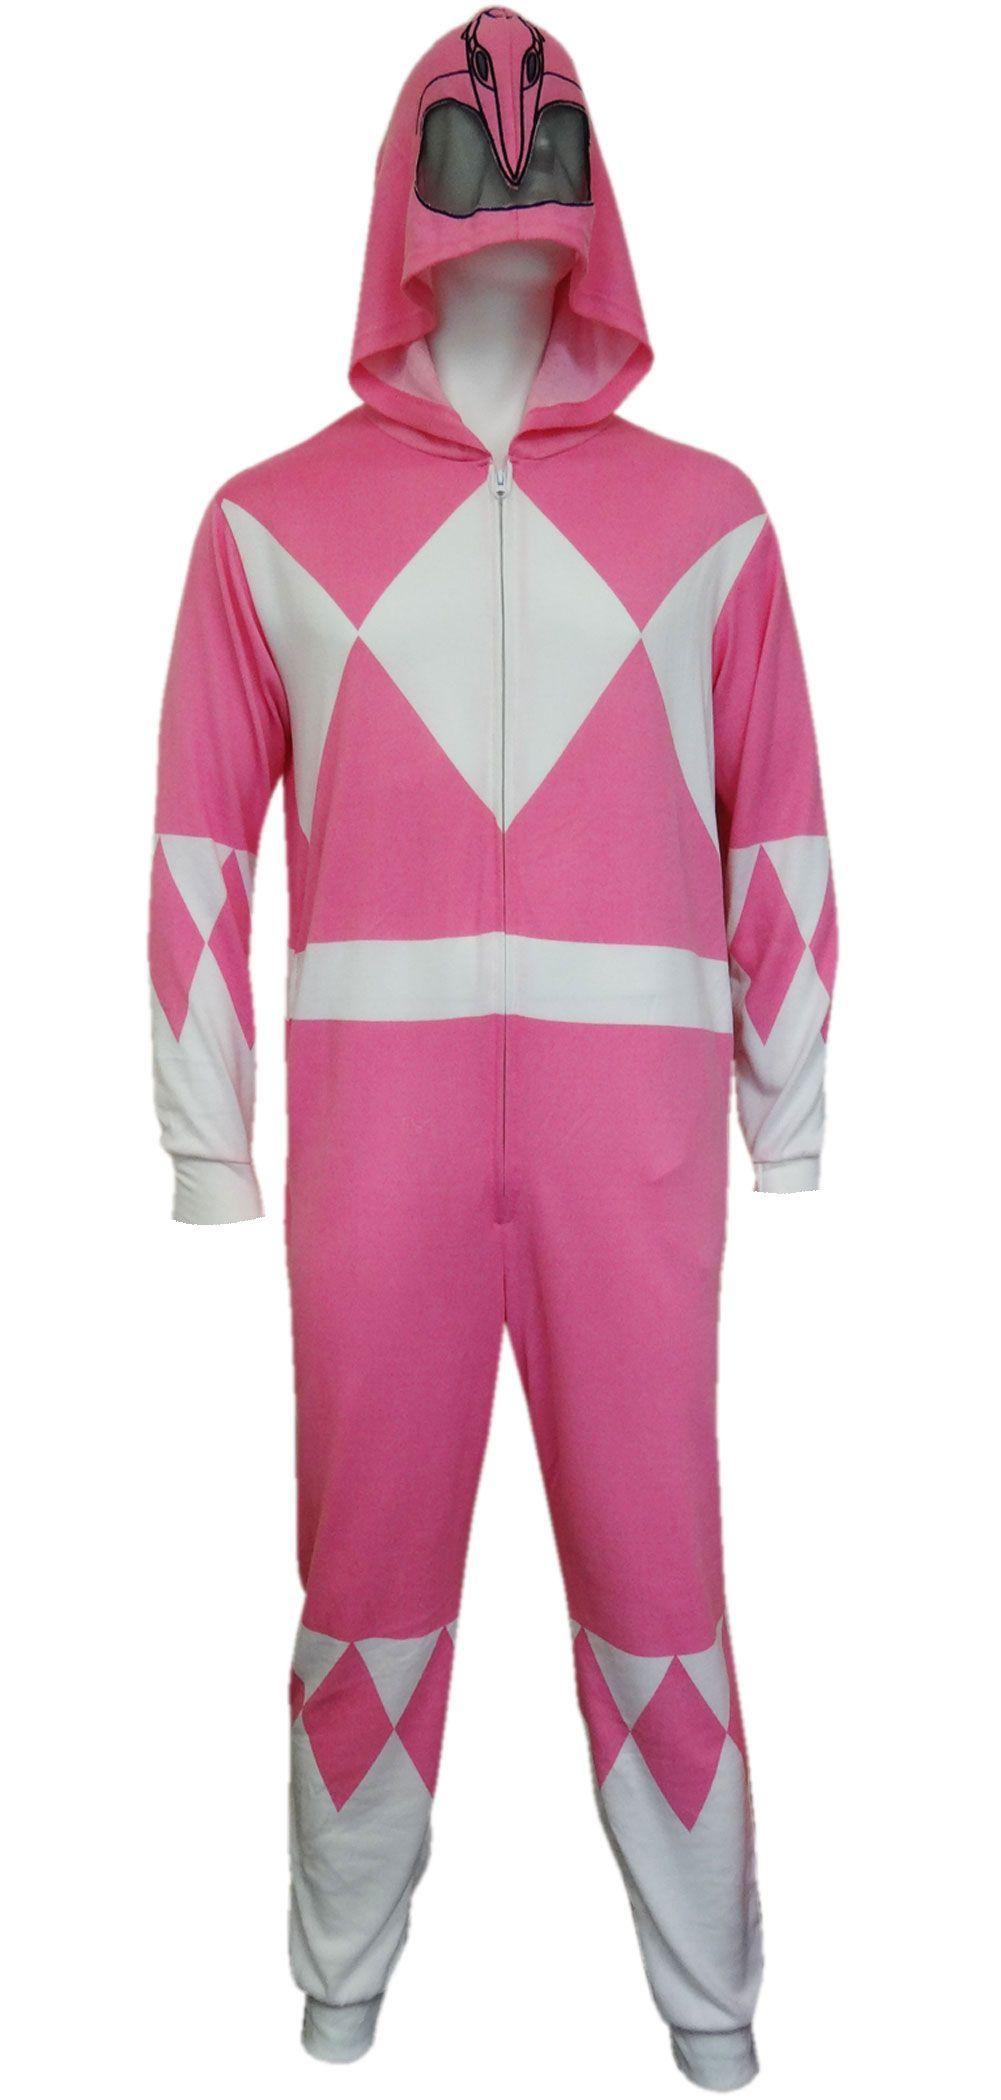 WebUndies.com Mighty Morphin Power Rangers Pink Ranger Onesie ...